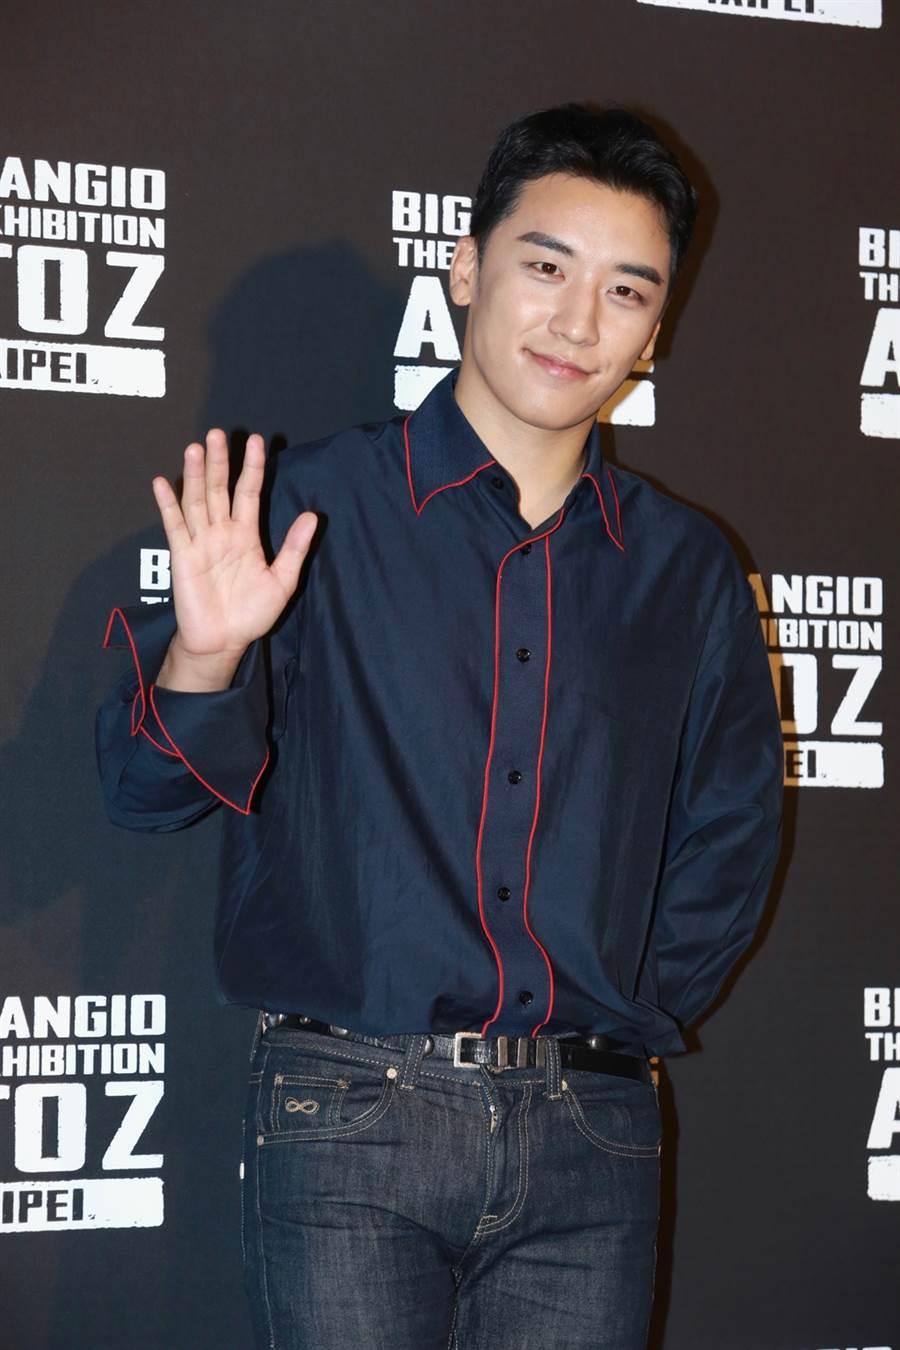 BIGBANG前成員勝利過去被拍來台上夜店。(圖/中時資料照片)